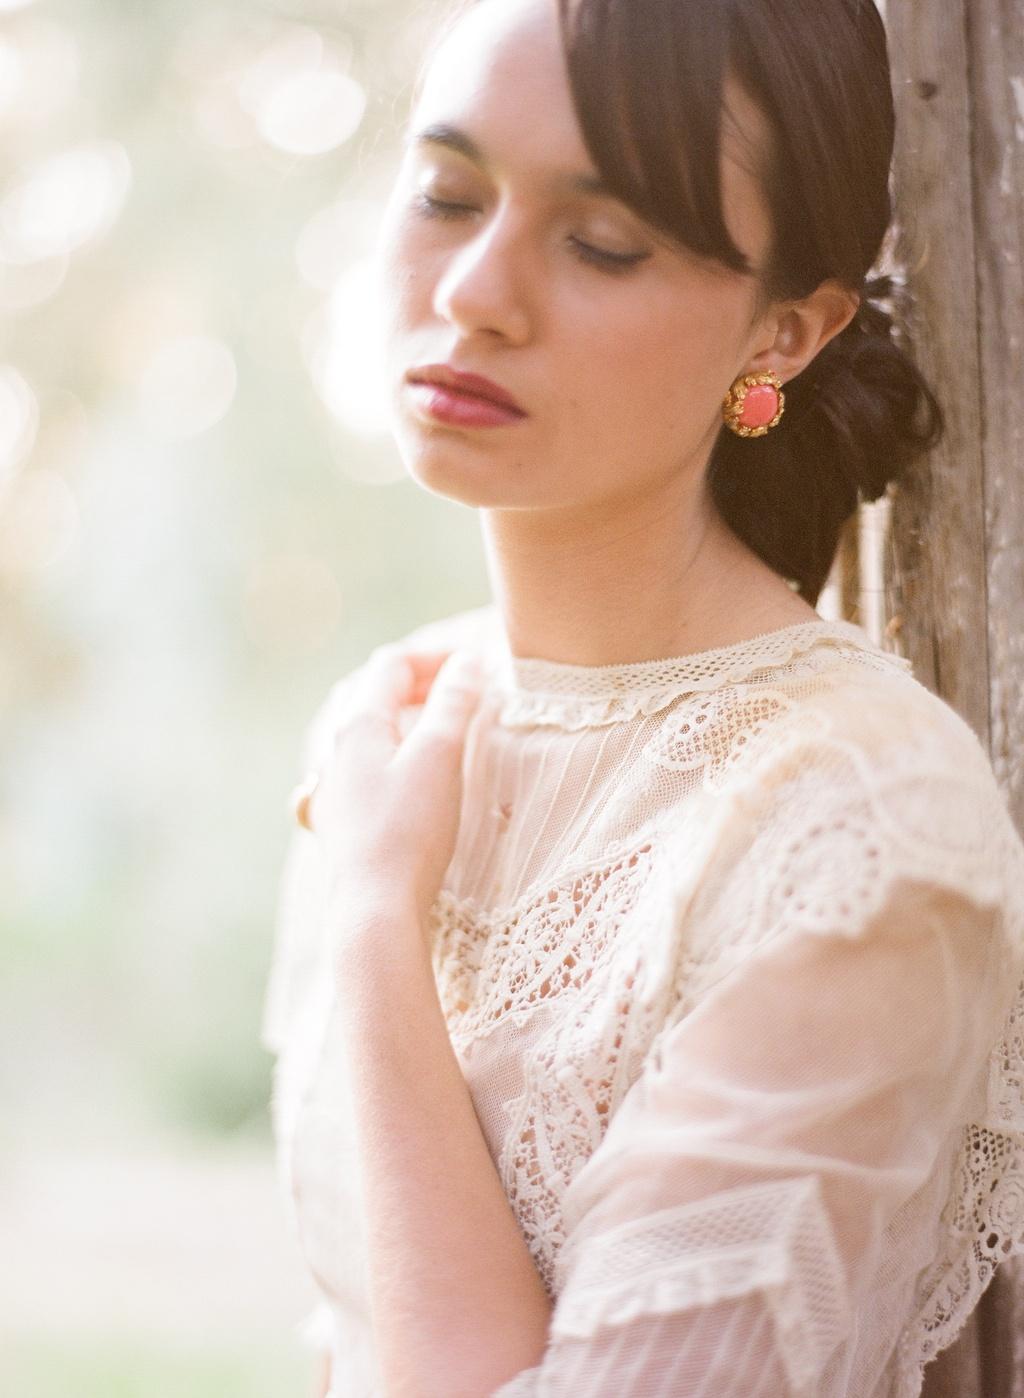 Styled-wedding-beaux-arts-tea-time-monique-lhuillier-santa-barbara-chic-wedding-dress-bridal-gown-lace44.full